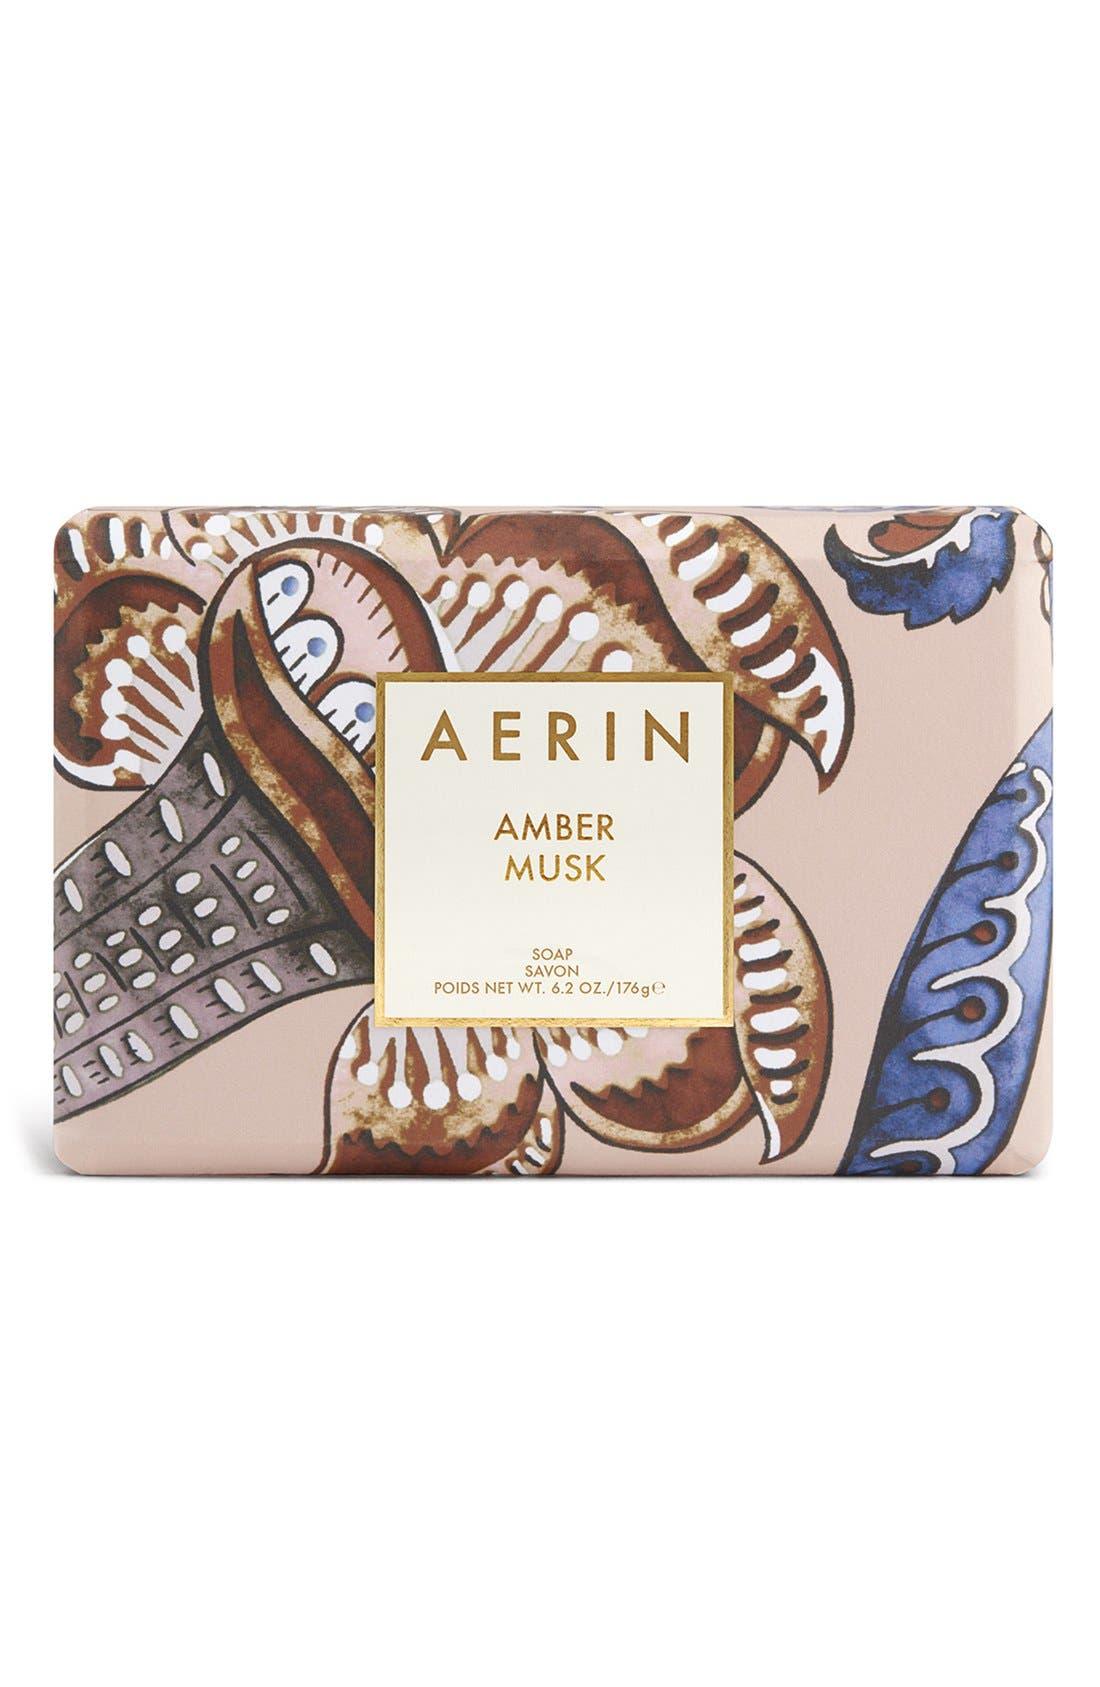 AERIN Beauty Amber Musk Soap,                             Main thumbnail 1, color,                             000